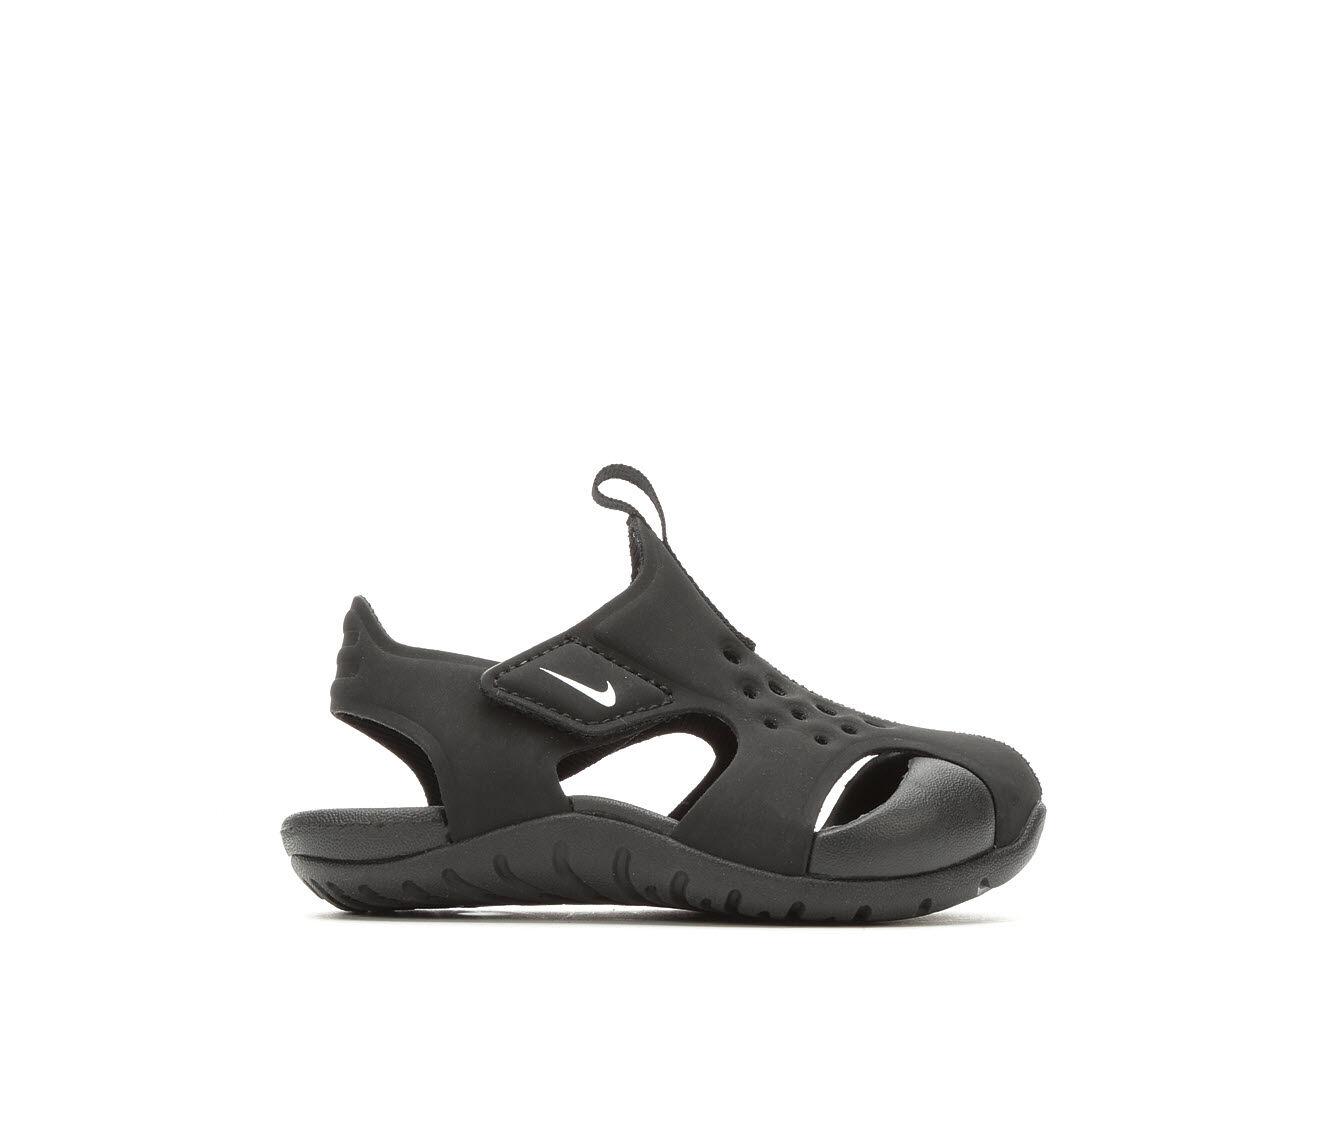 Sunray Water Protext Infantamp; Toddler Shoes 2 Kids' Nike FJ3clTK1